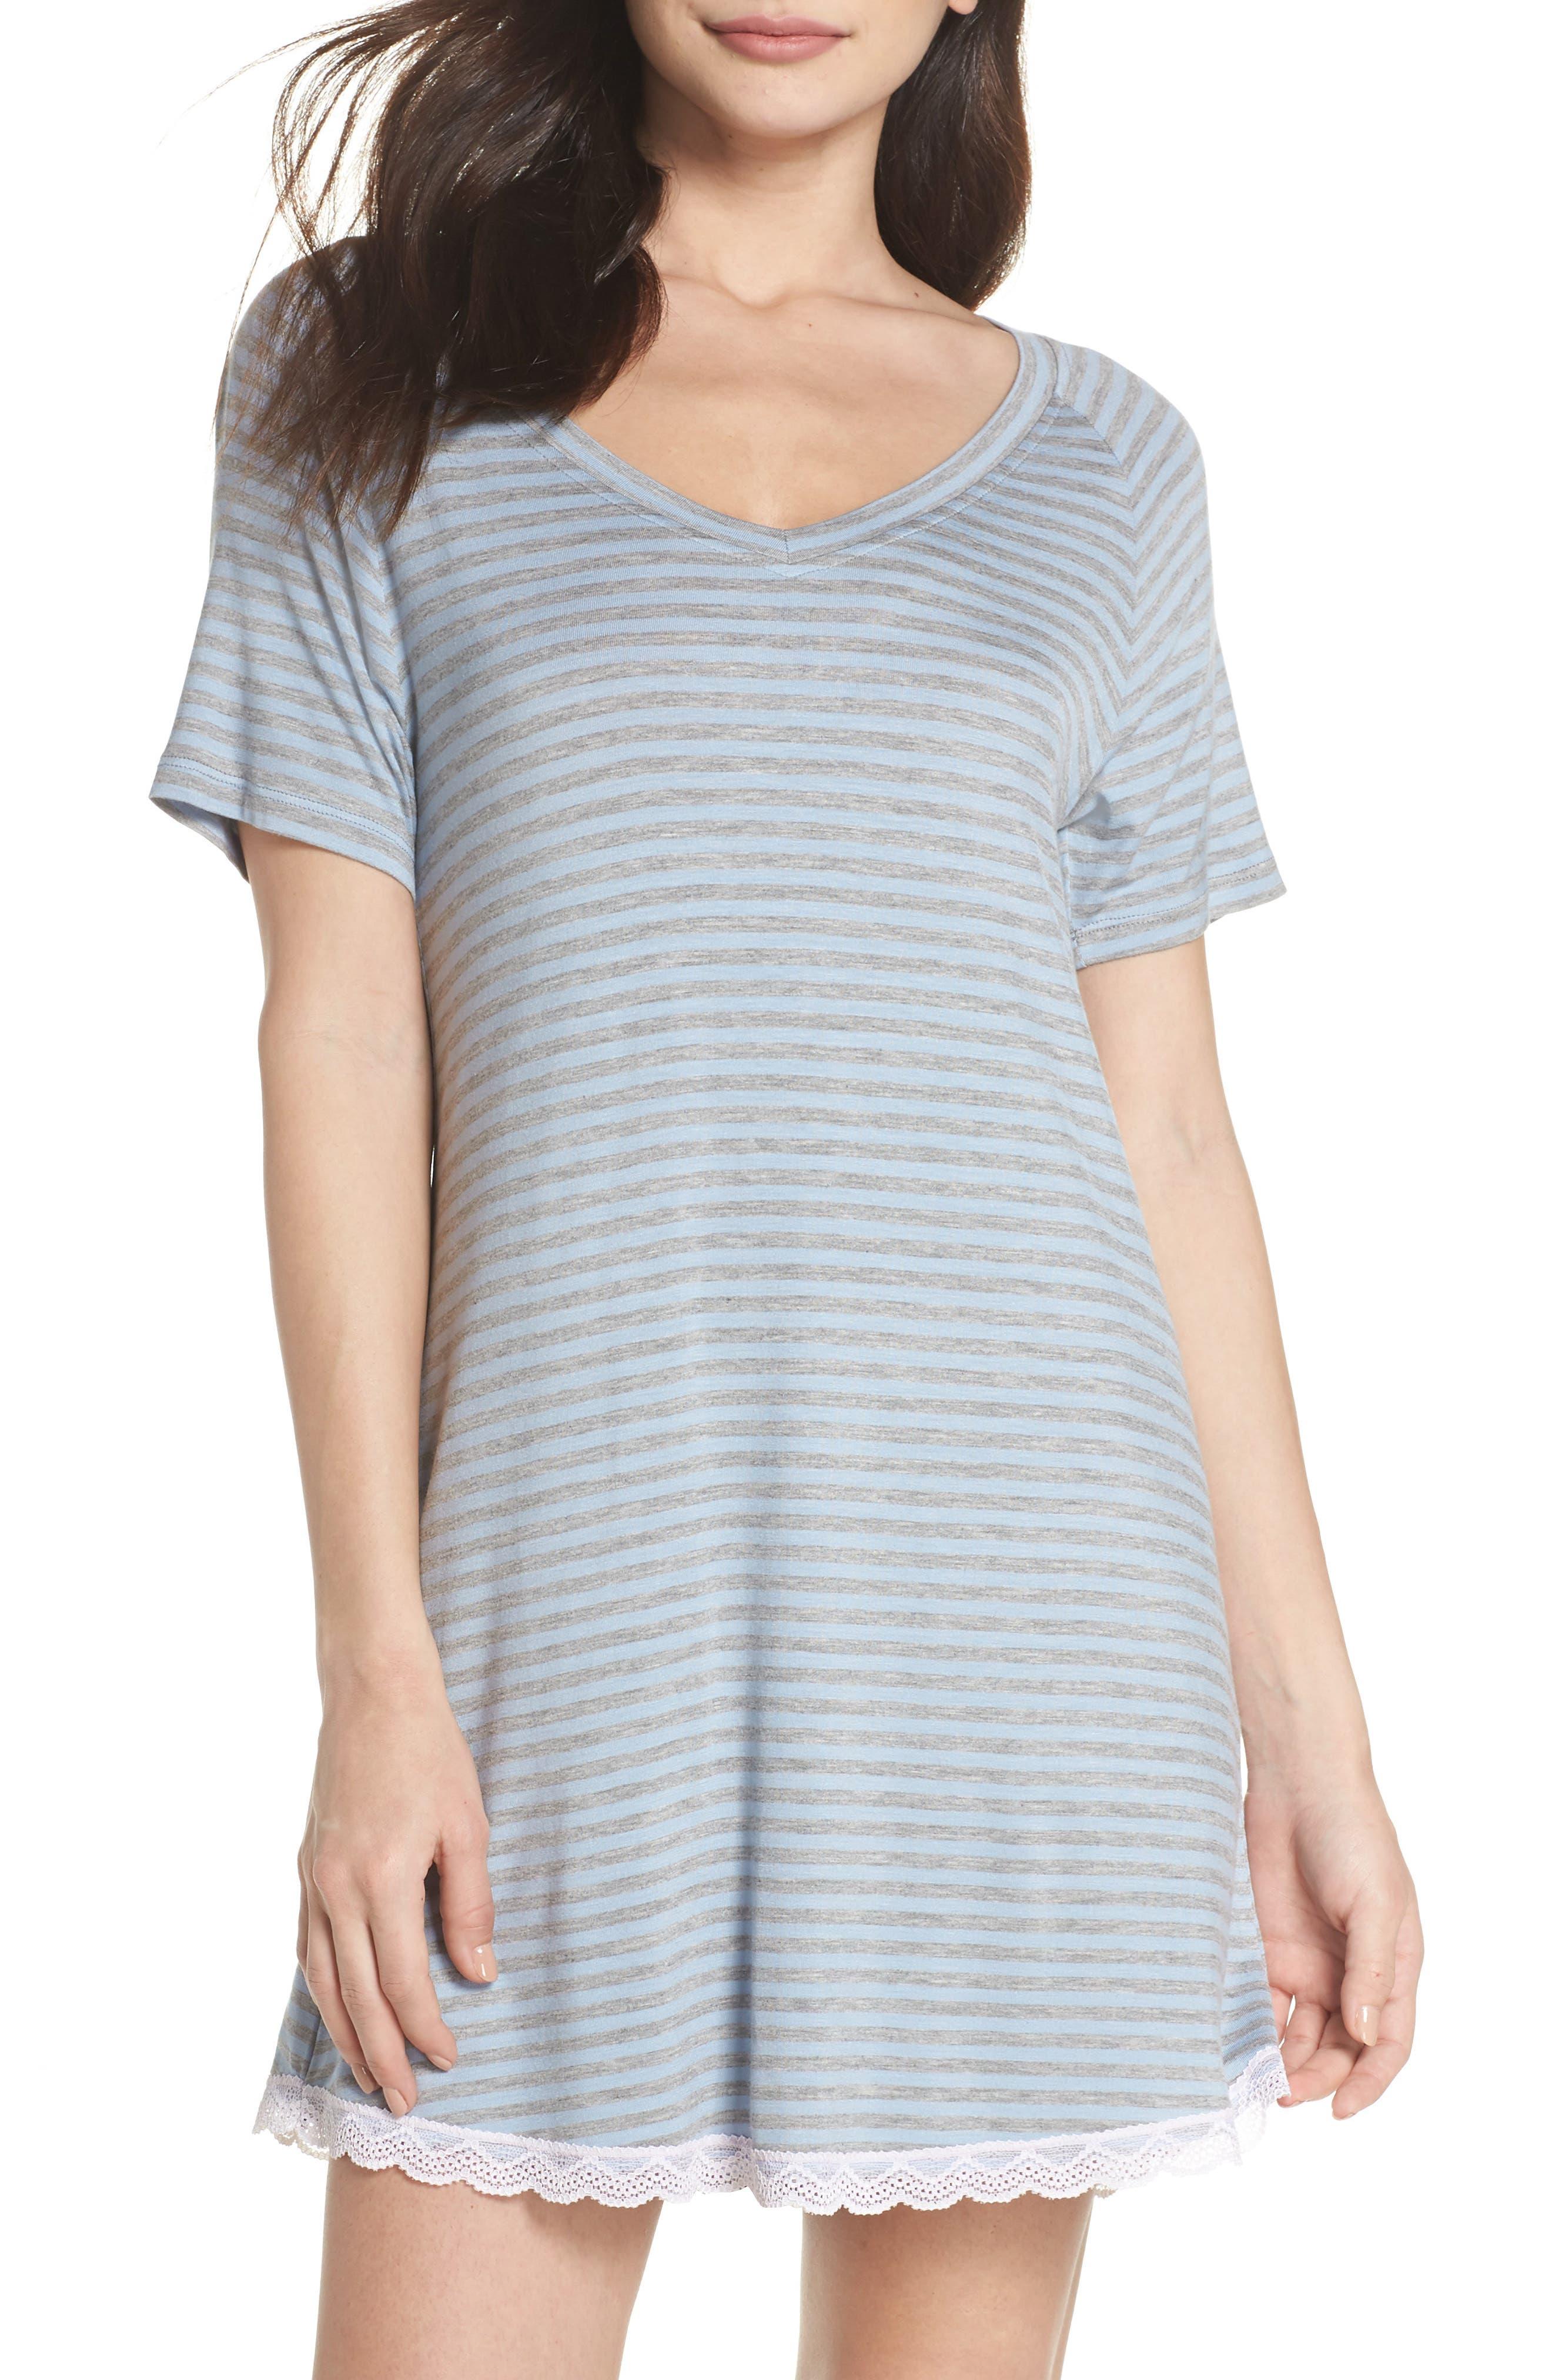 Honeydew Lace Trim Sleep Shirt (2 for $60)